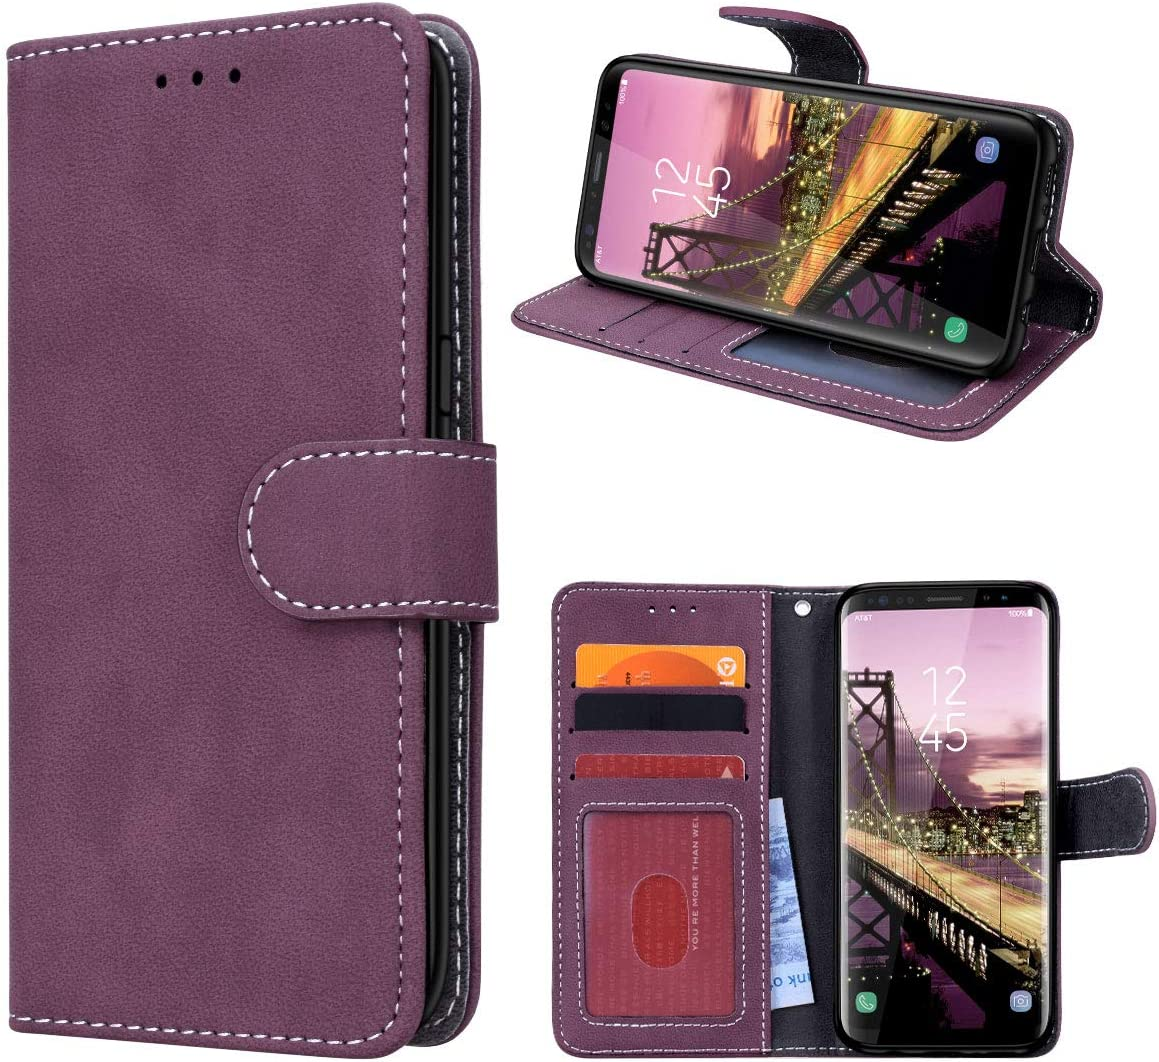 Prologfer Samsung Galaxy S8 H/ülle Braun Lederh/ülle Handytasche Karten Slot Case Cover Magnetverschluss Flip Bookstyle Standfunktion mit Magnet Schutzh/ülle f/ür Samsung S8 Handyh/ülle